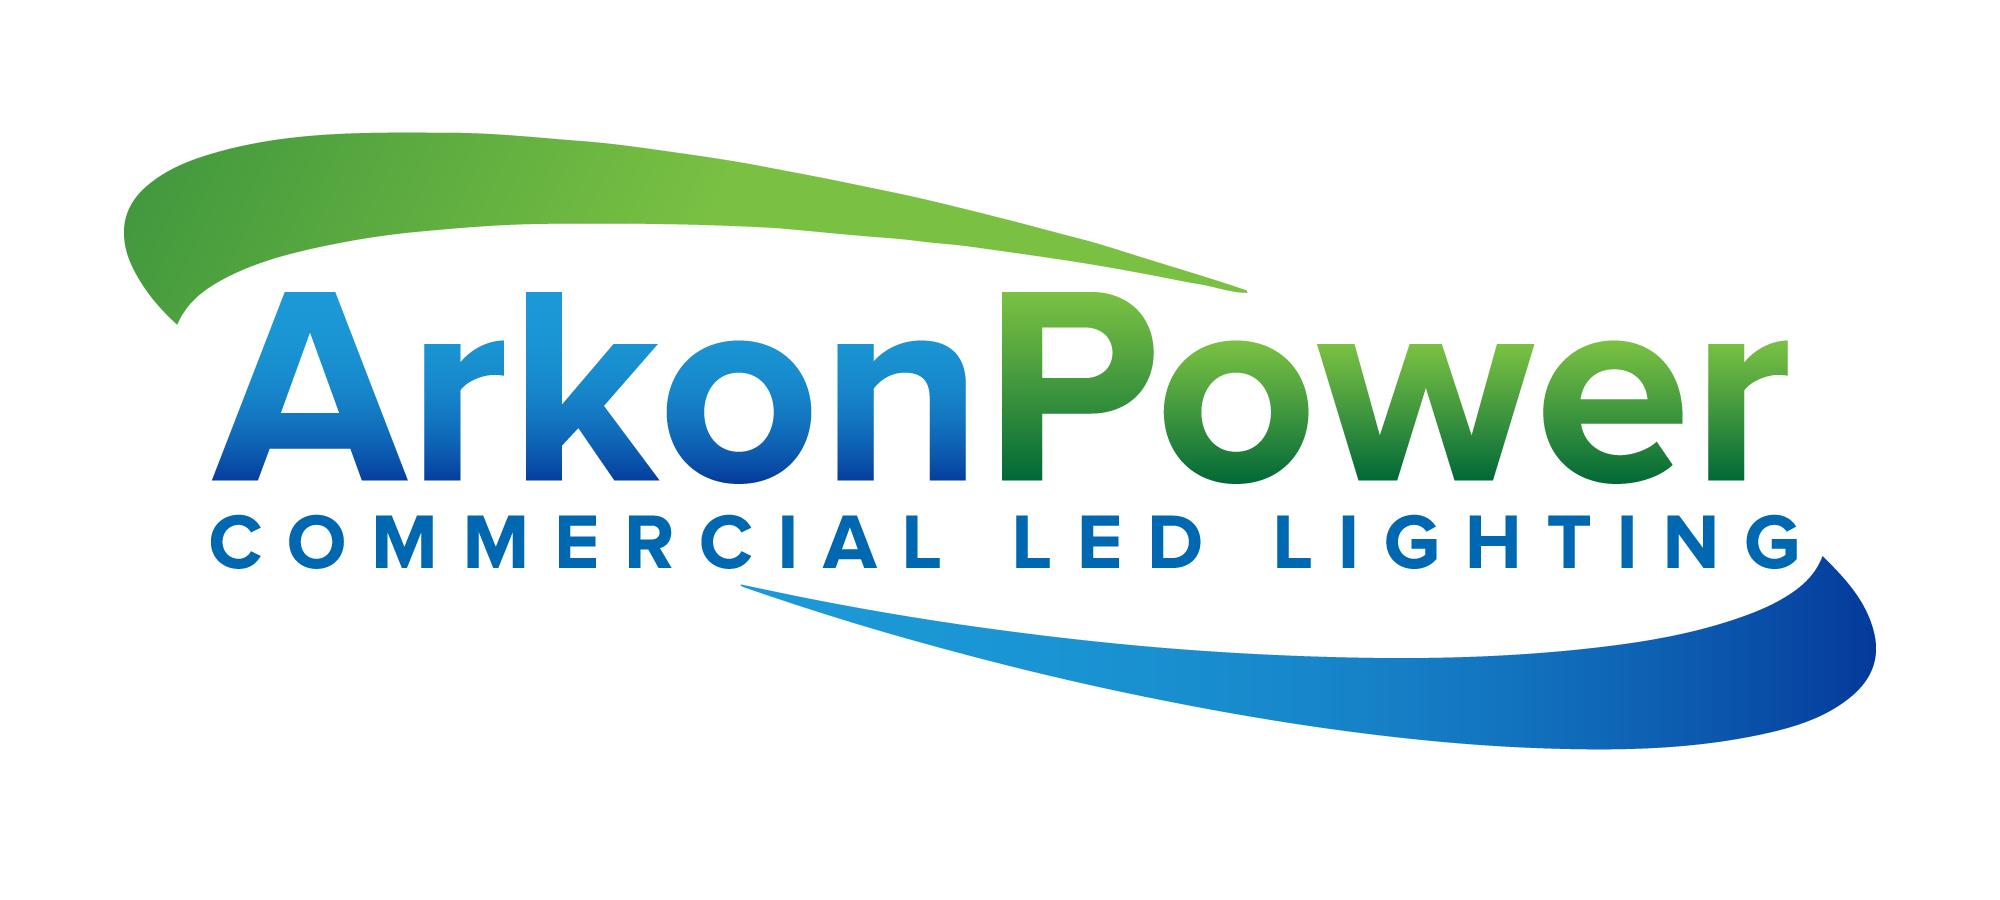 Arkon Power